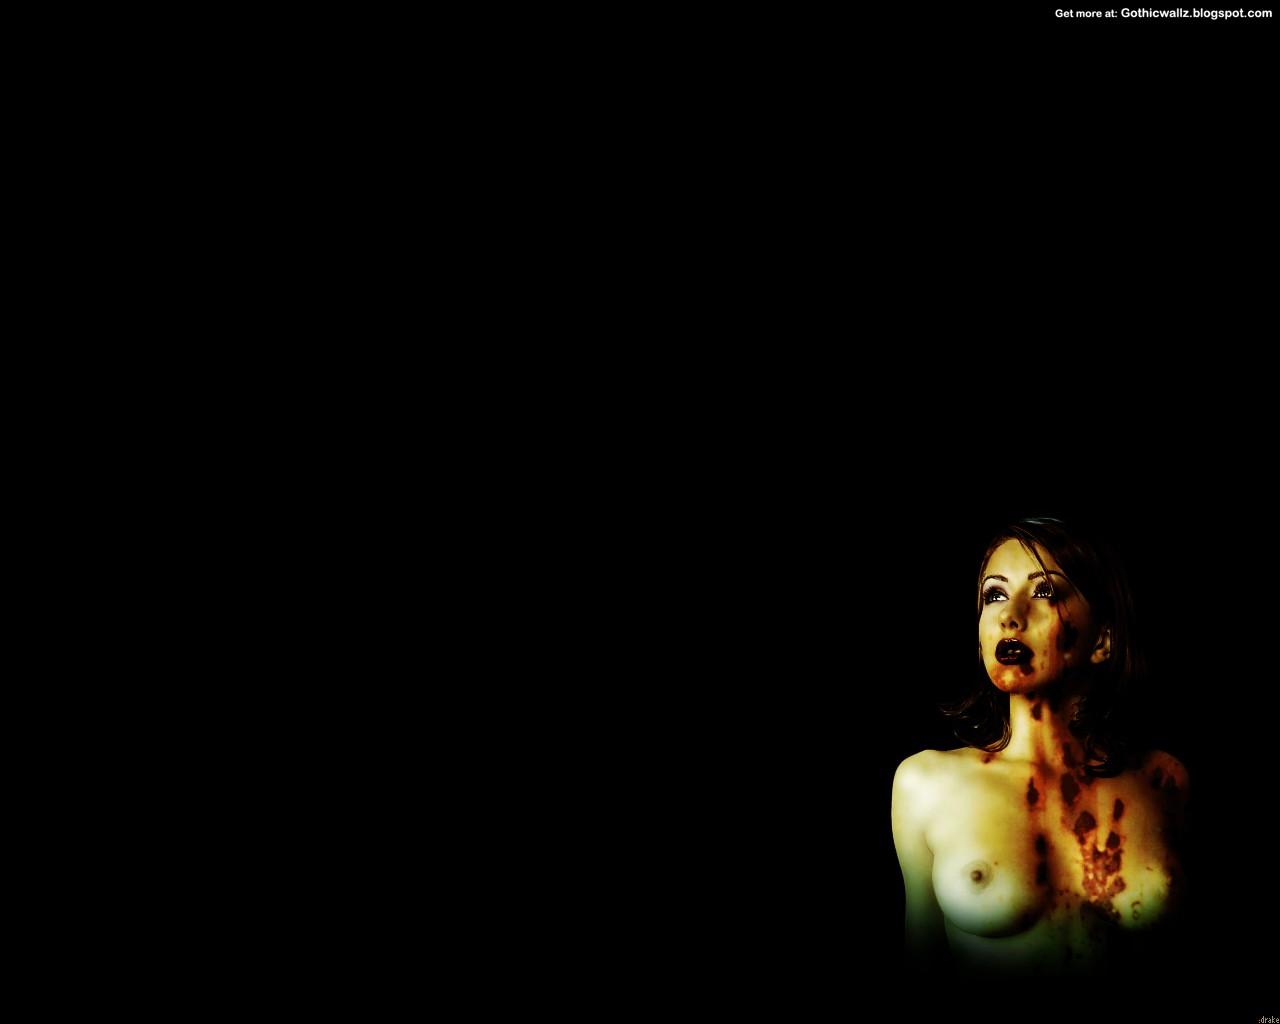 Gothic Wallpaper Preview: Obscura-Sentenza